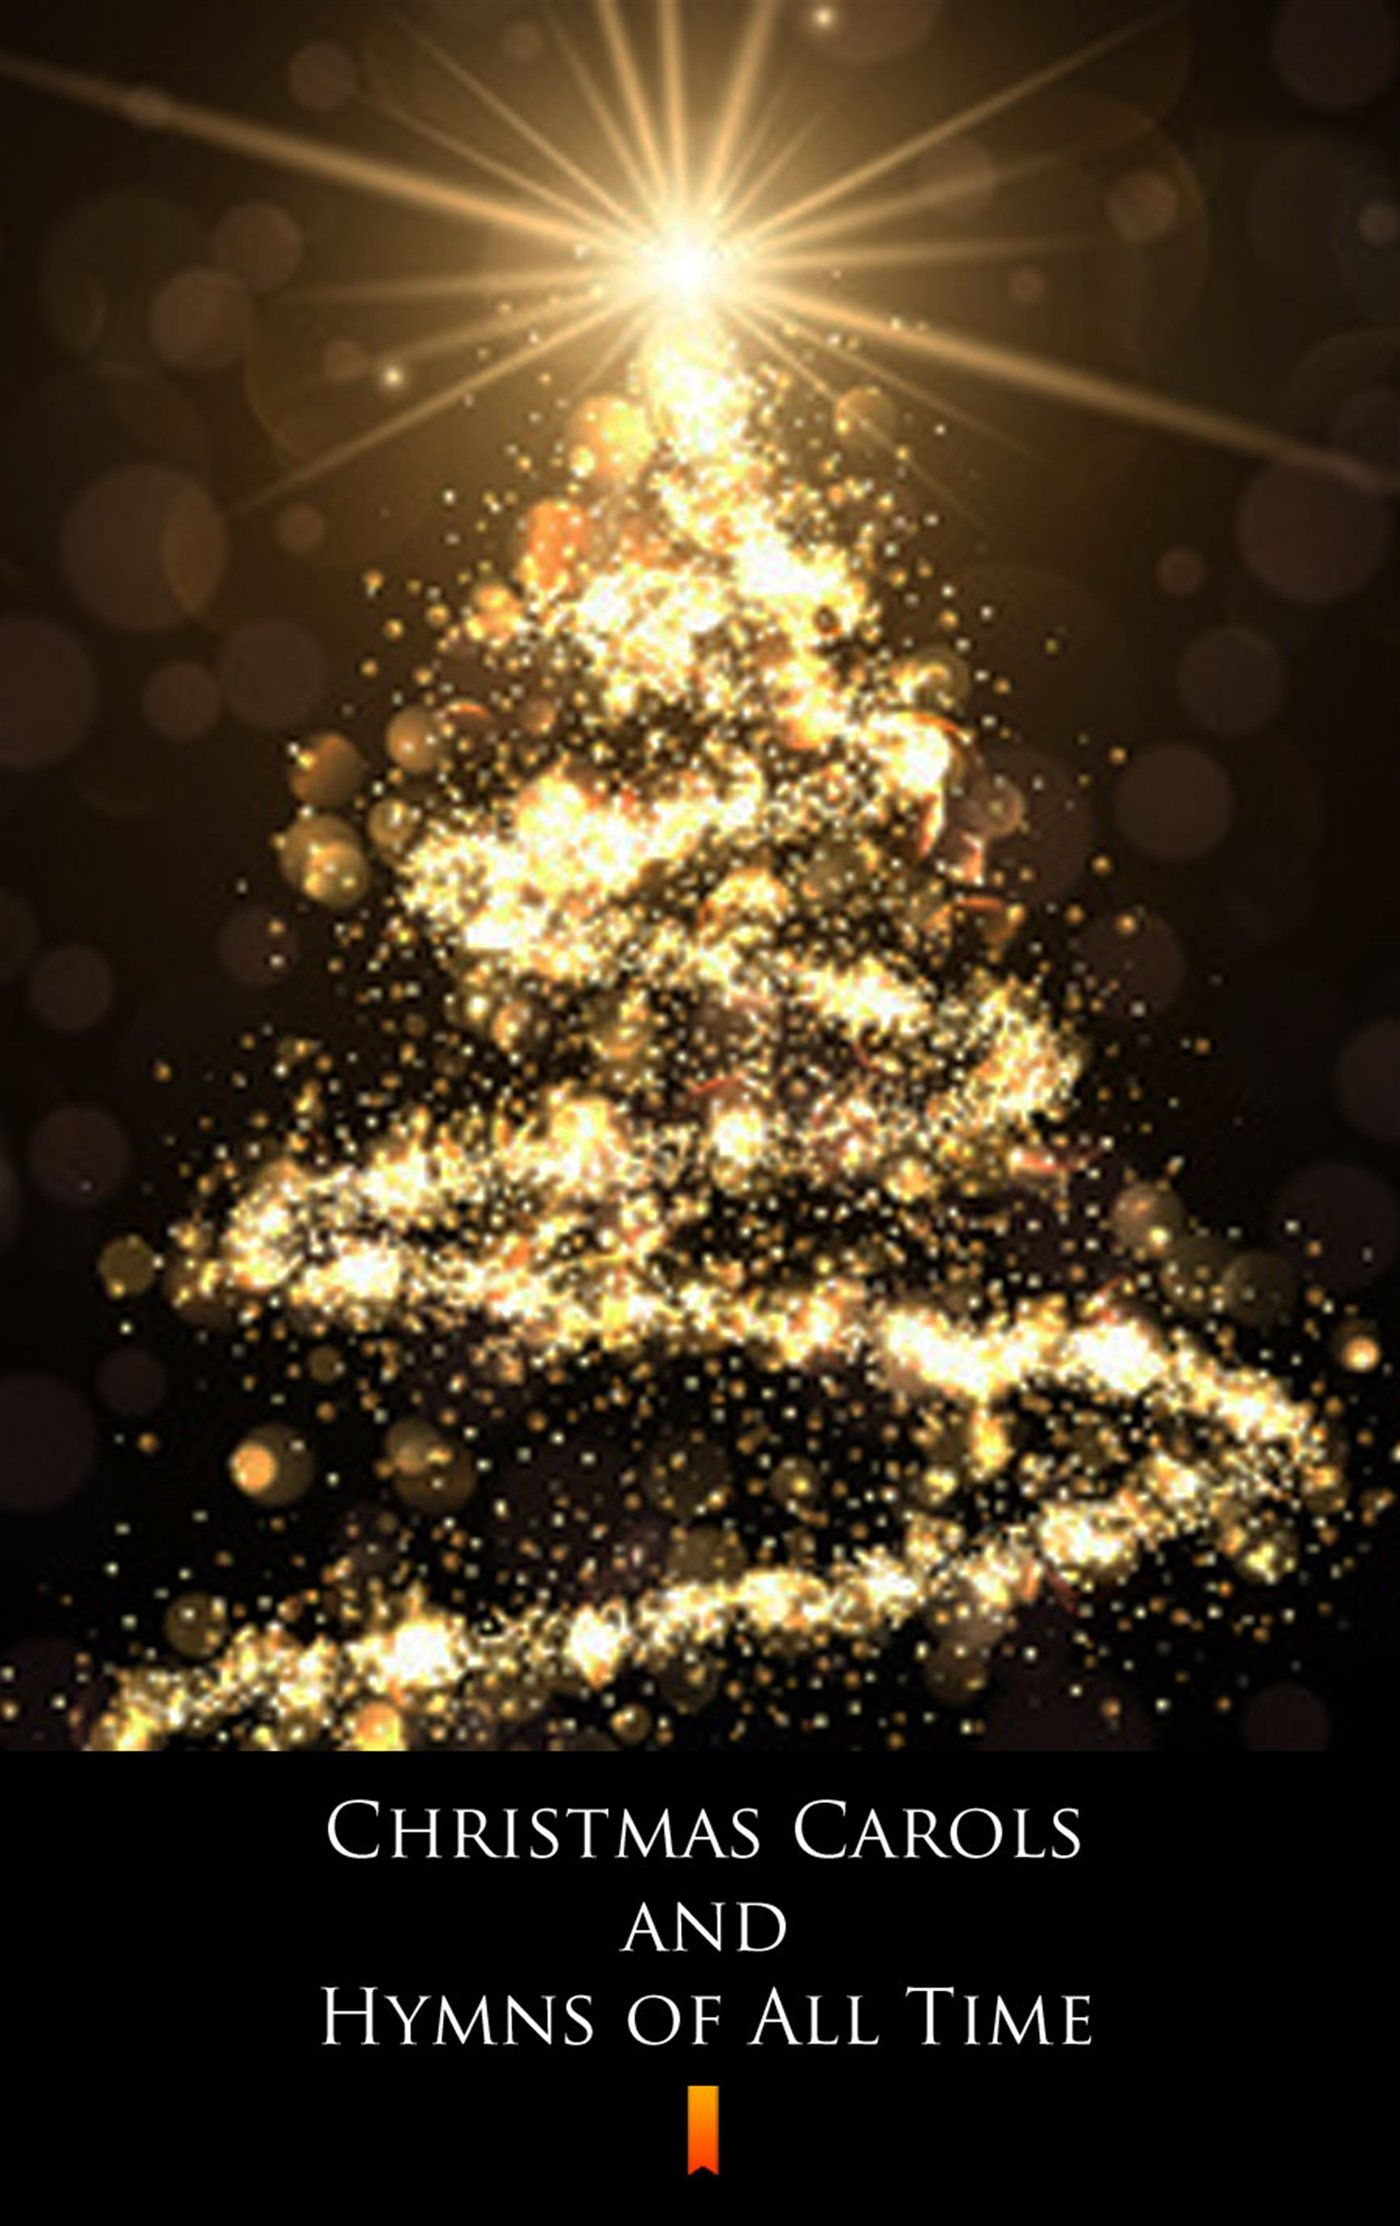 Christmas Carols and Hymns of All Time - Ebook (Książka na Kindle) do pobrania w formacie MOBI